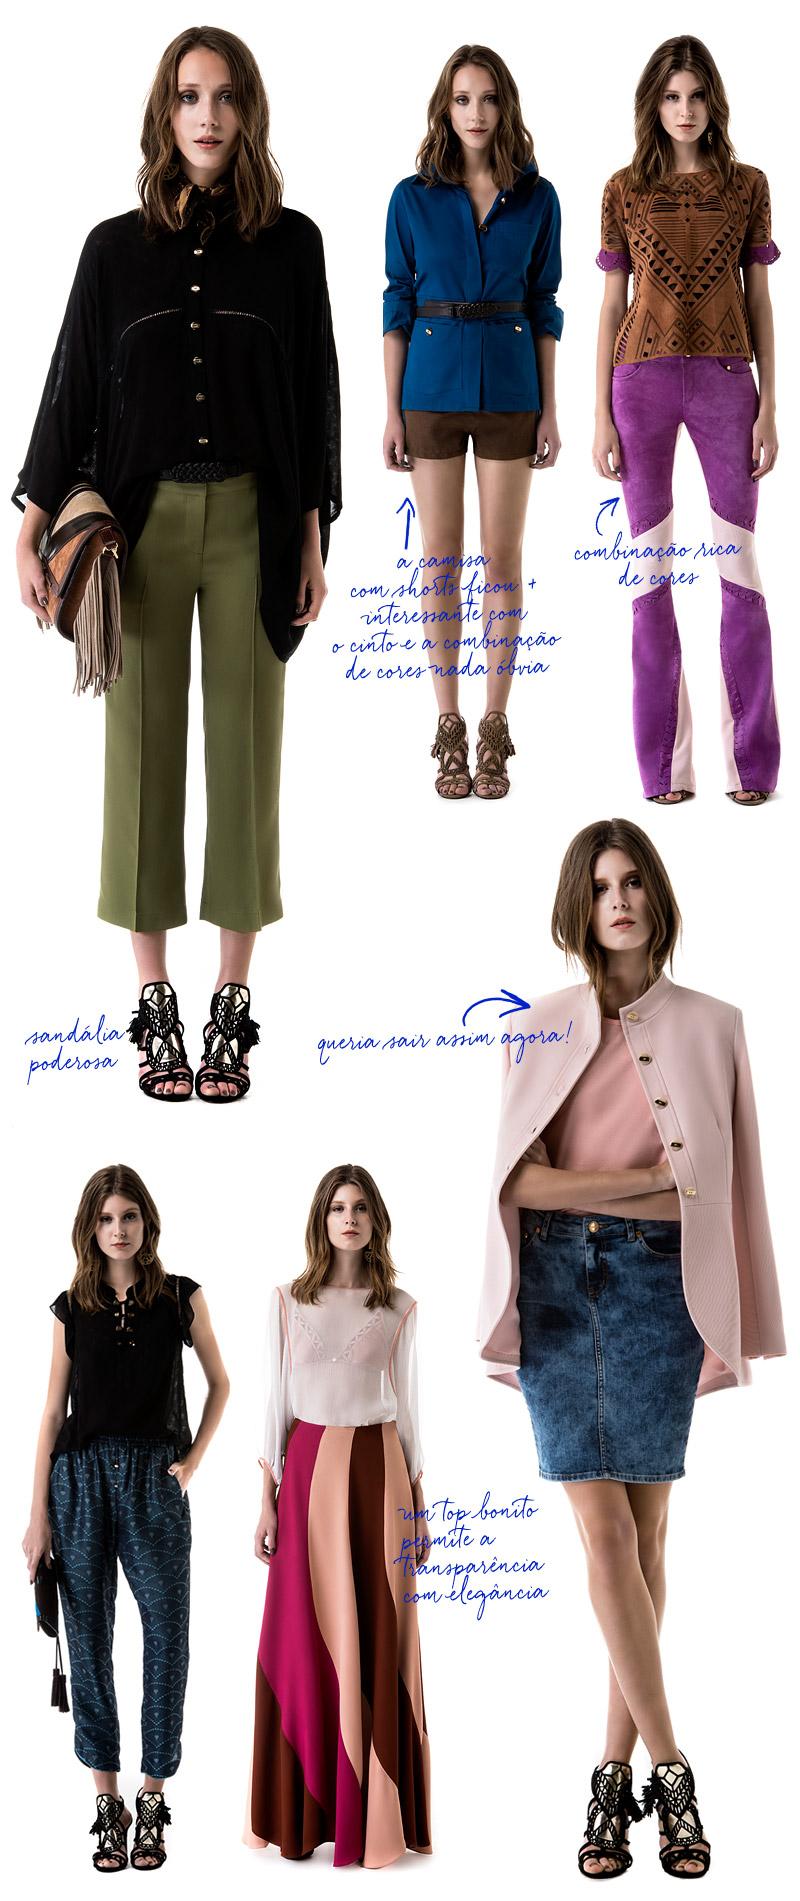 living-gazette-barbara-resende-moda-lancamento-colecao-lilly-sarti-verao-2016-lookbook